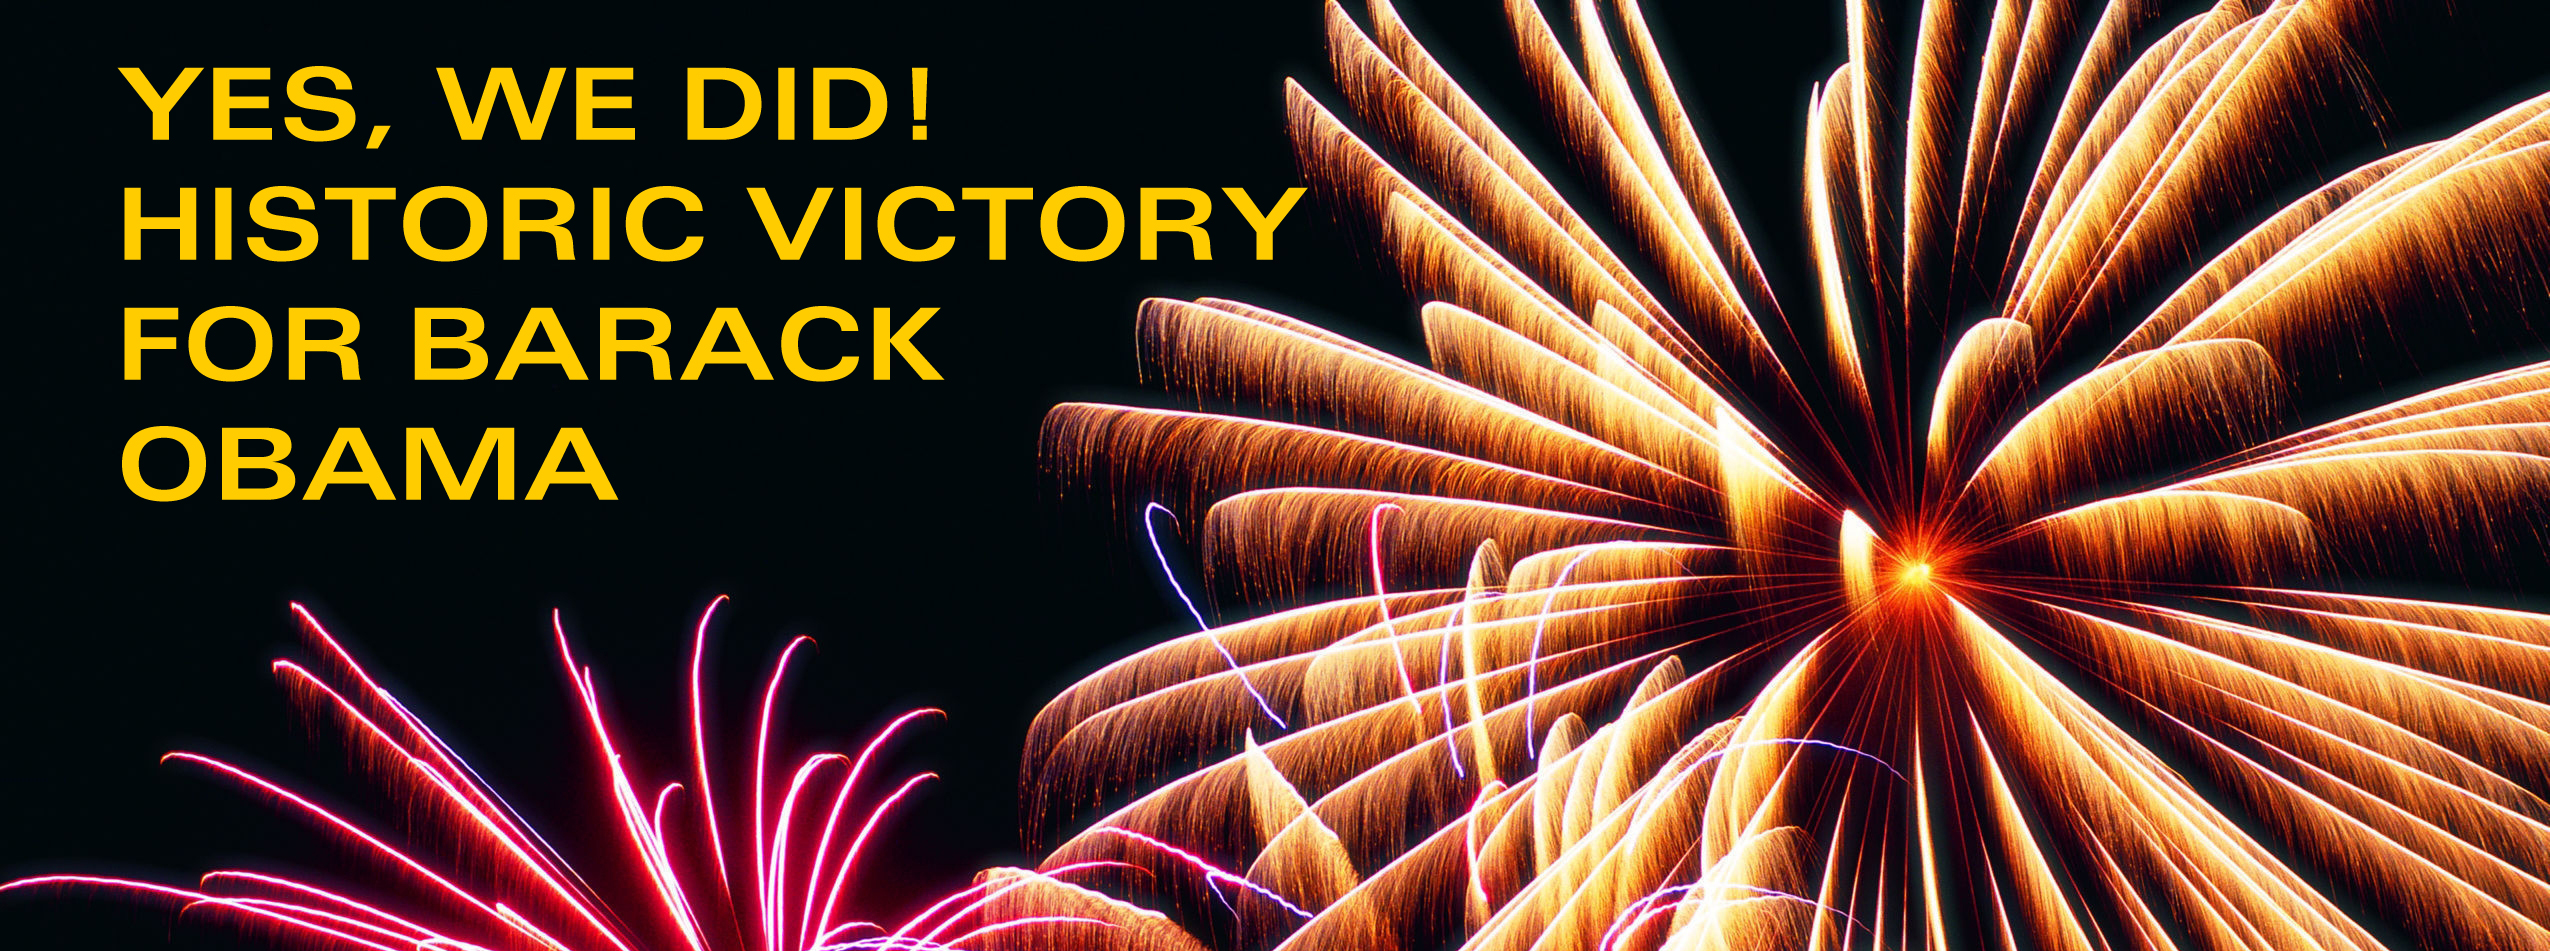 fireworks_win copy.jpg